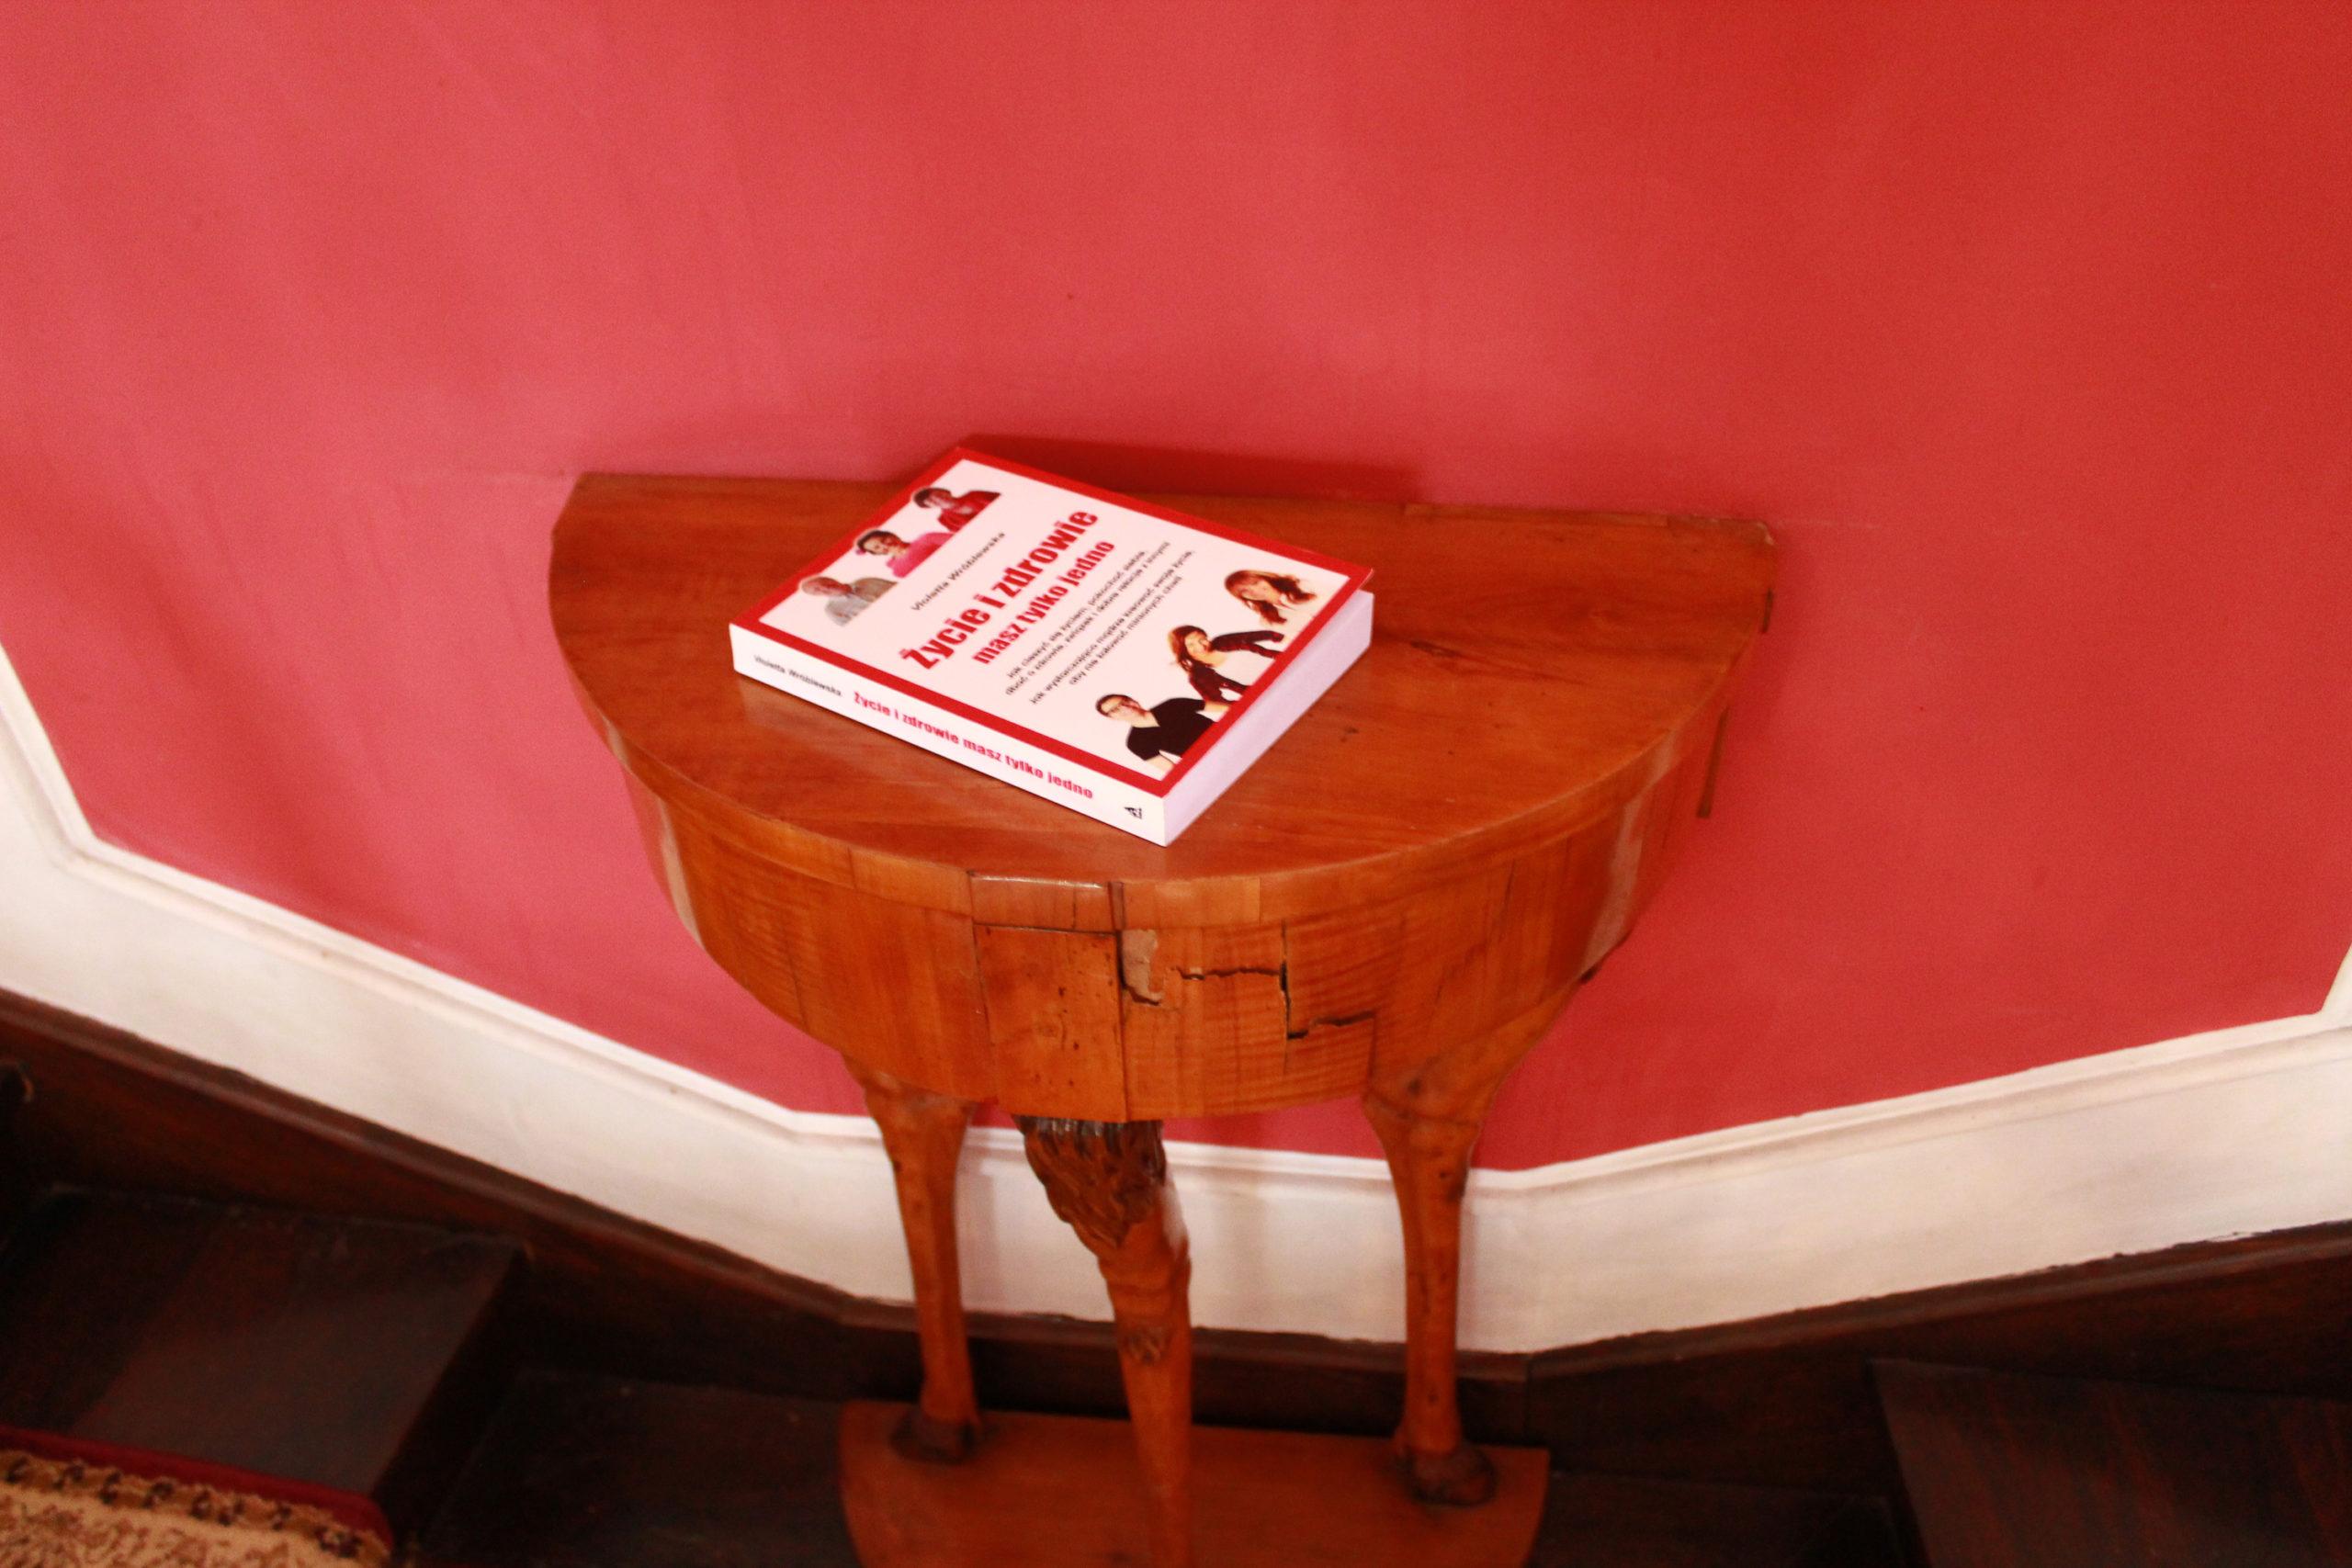 książka na stoliku